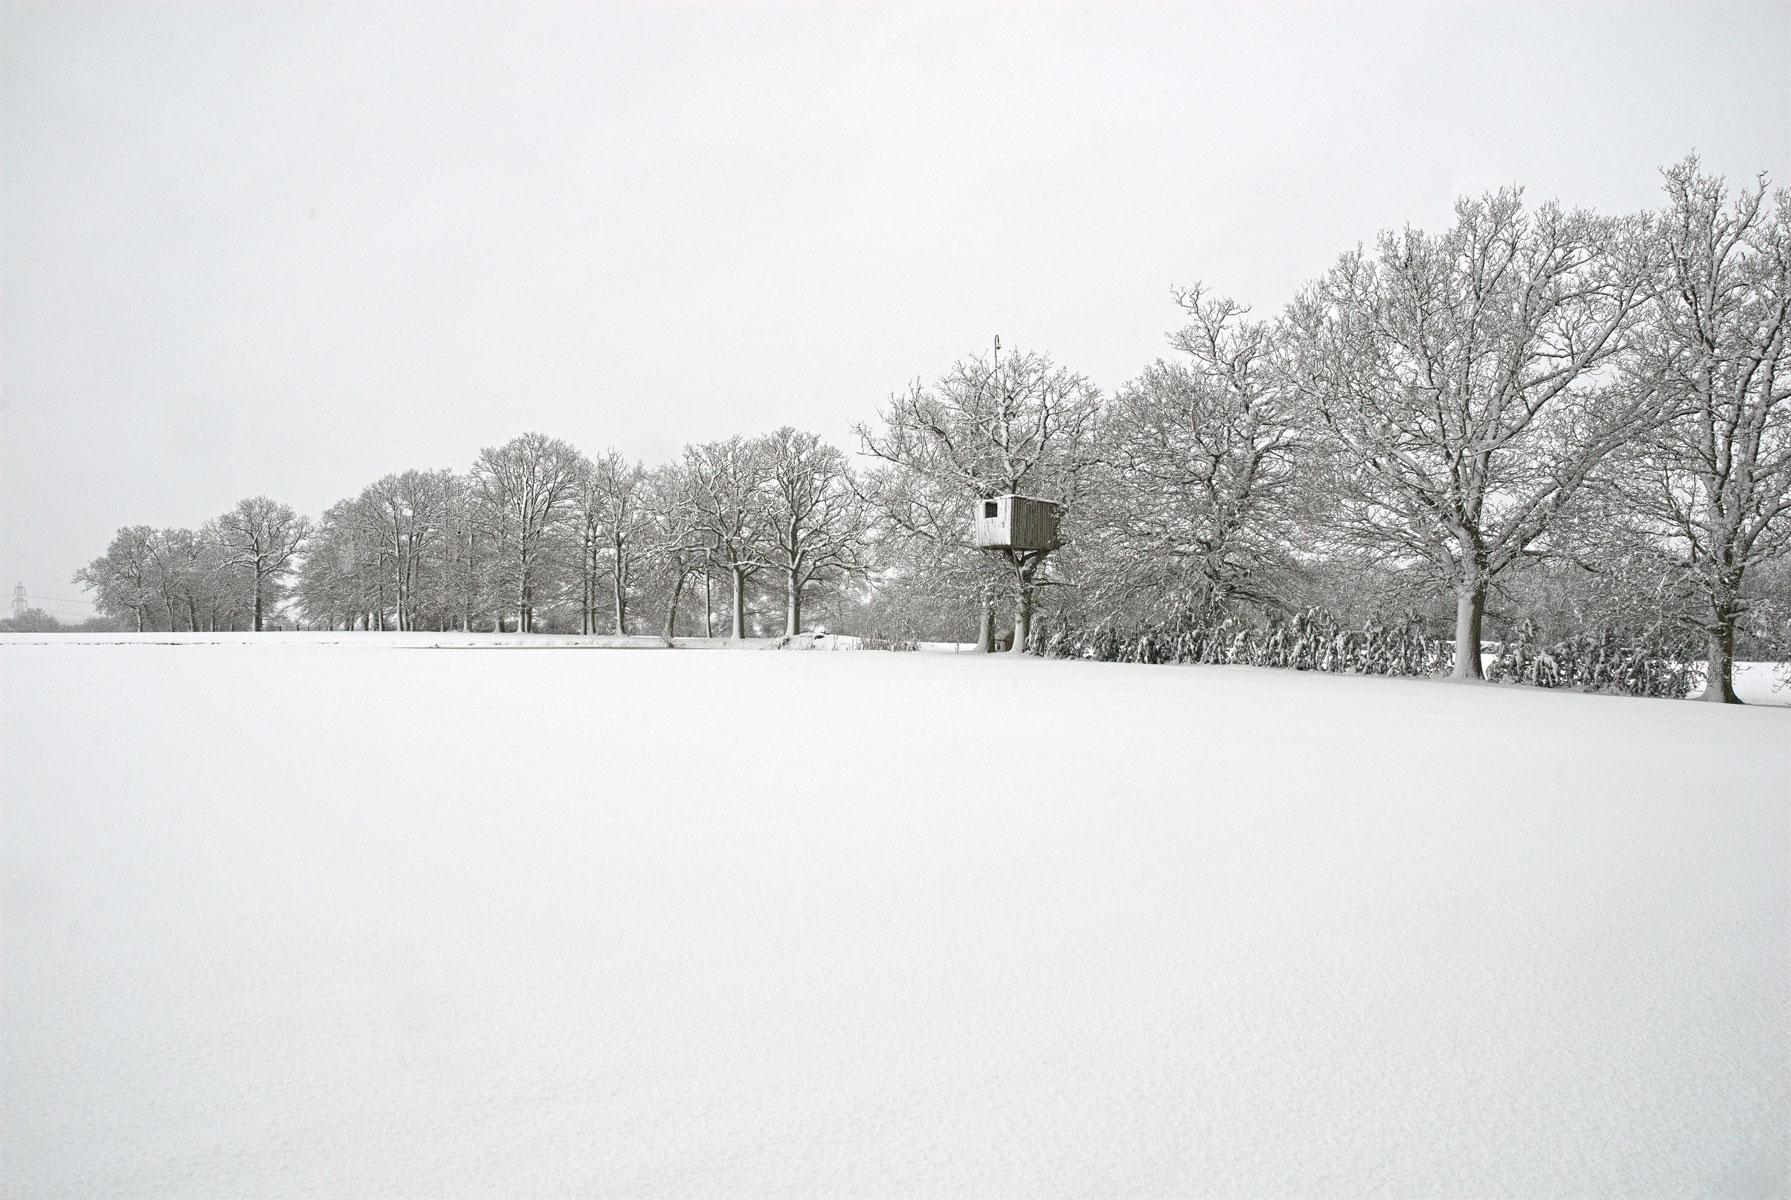 West Chiltington Snow